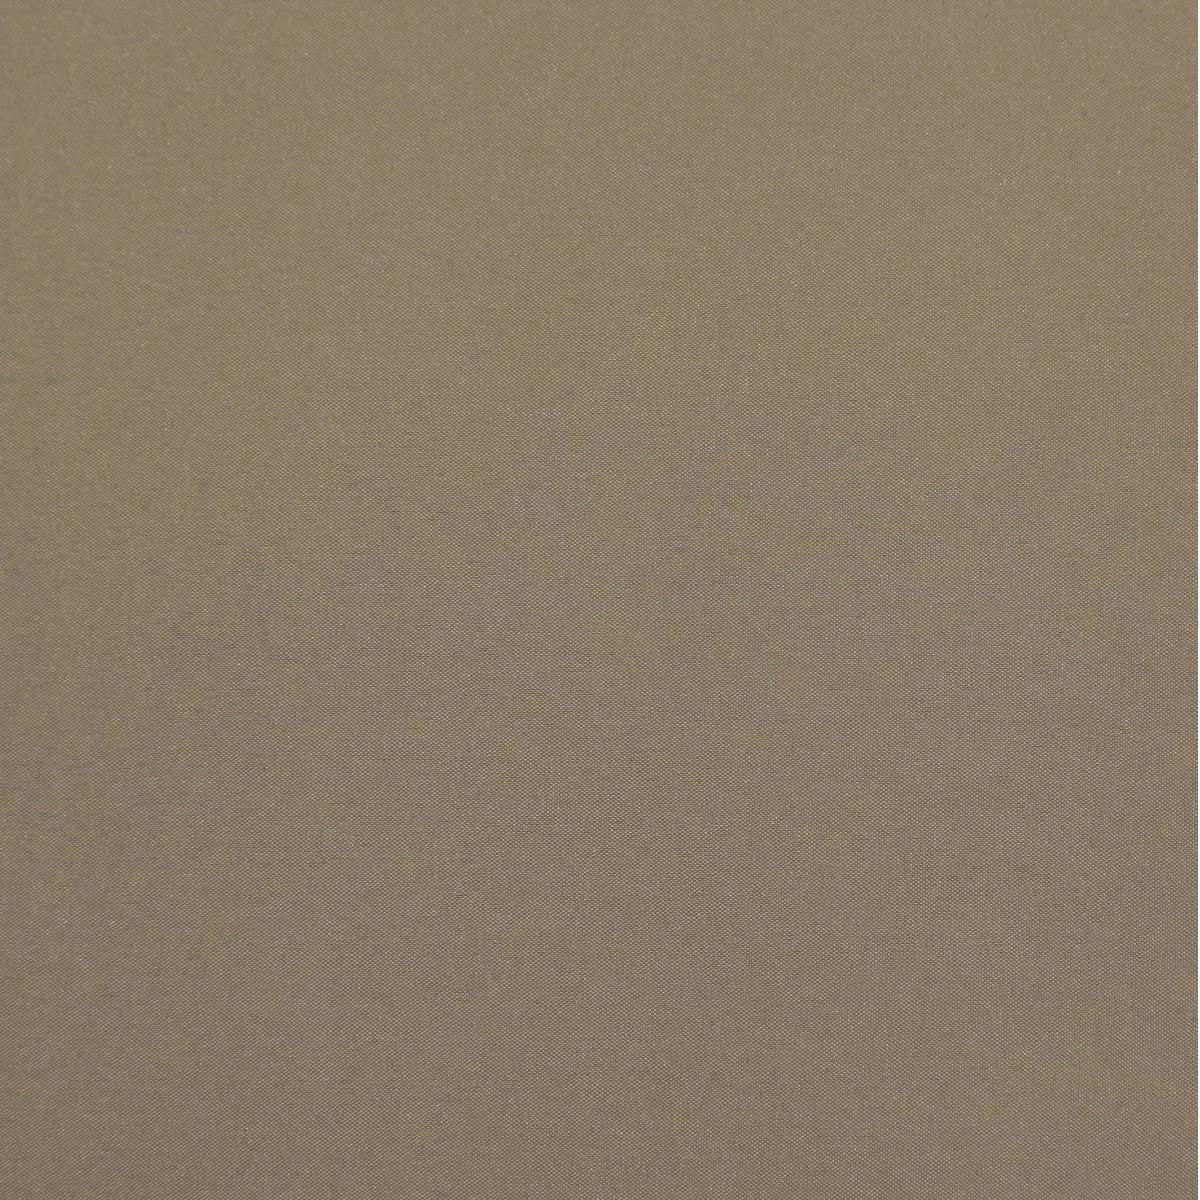 Cortina Blackout 100% Comfort Taupe 2,60 x 1,70 Bella Janela